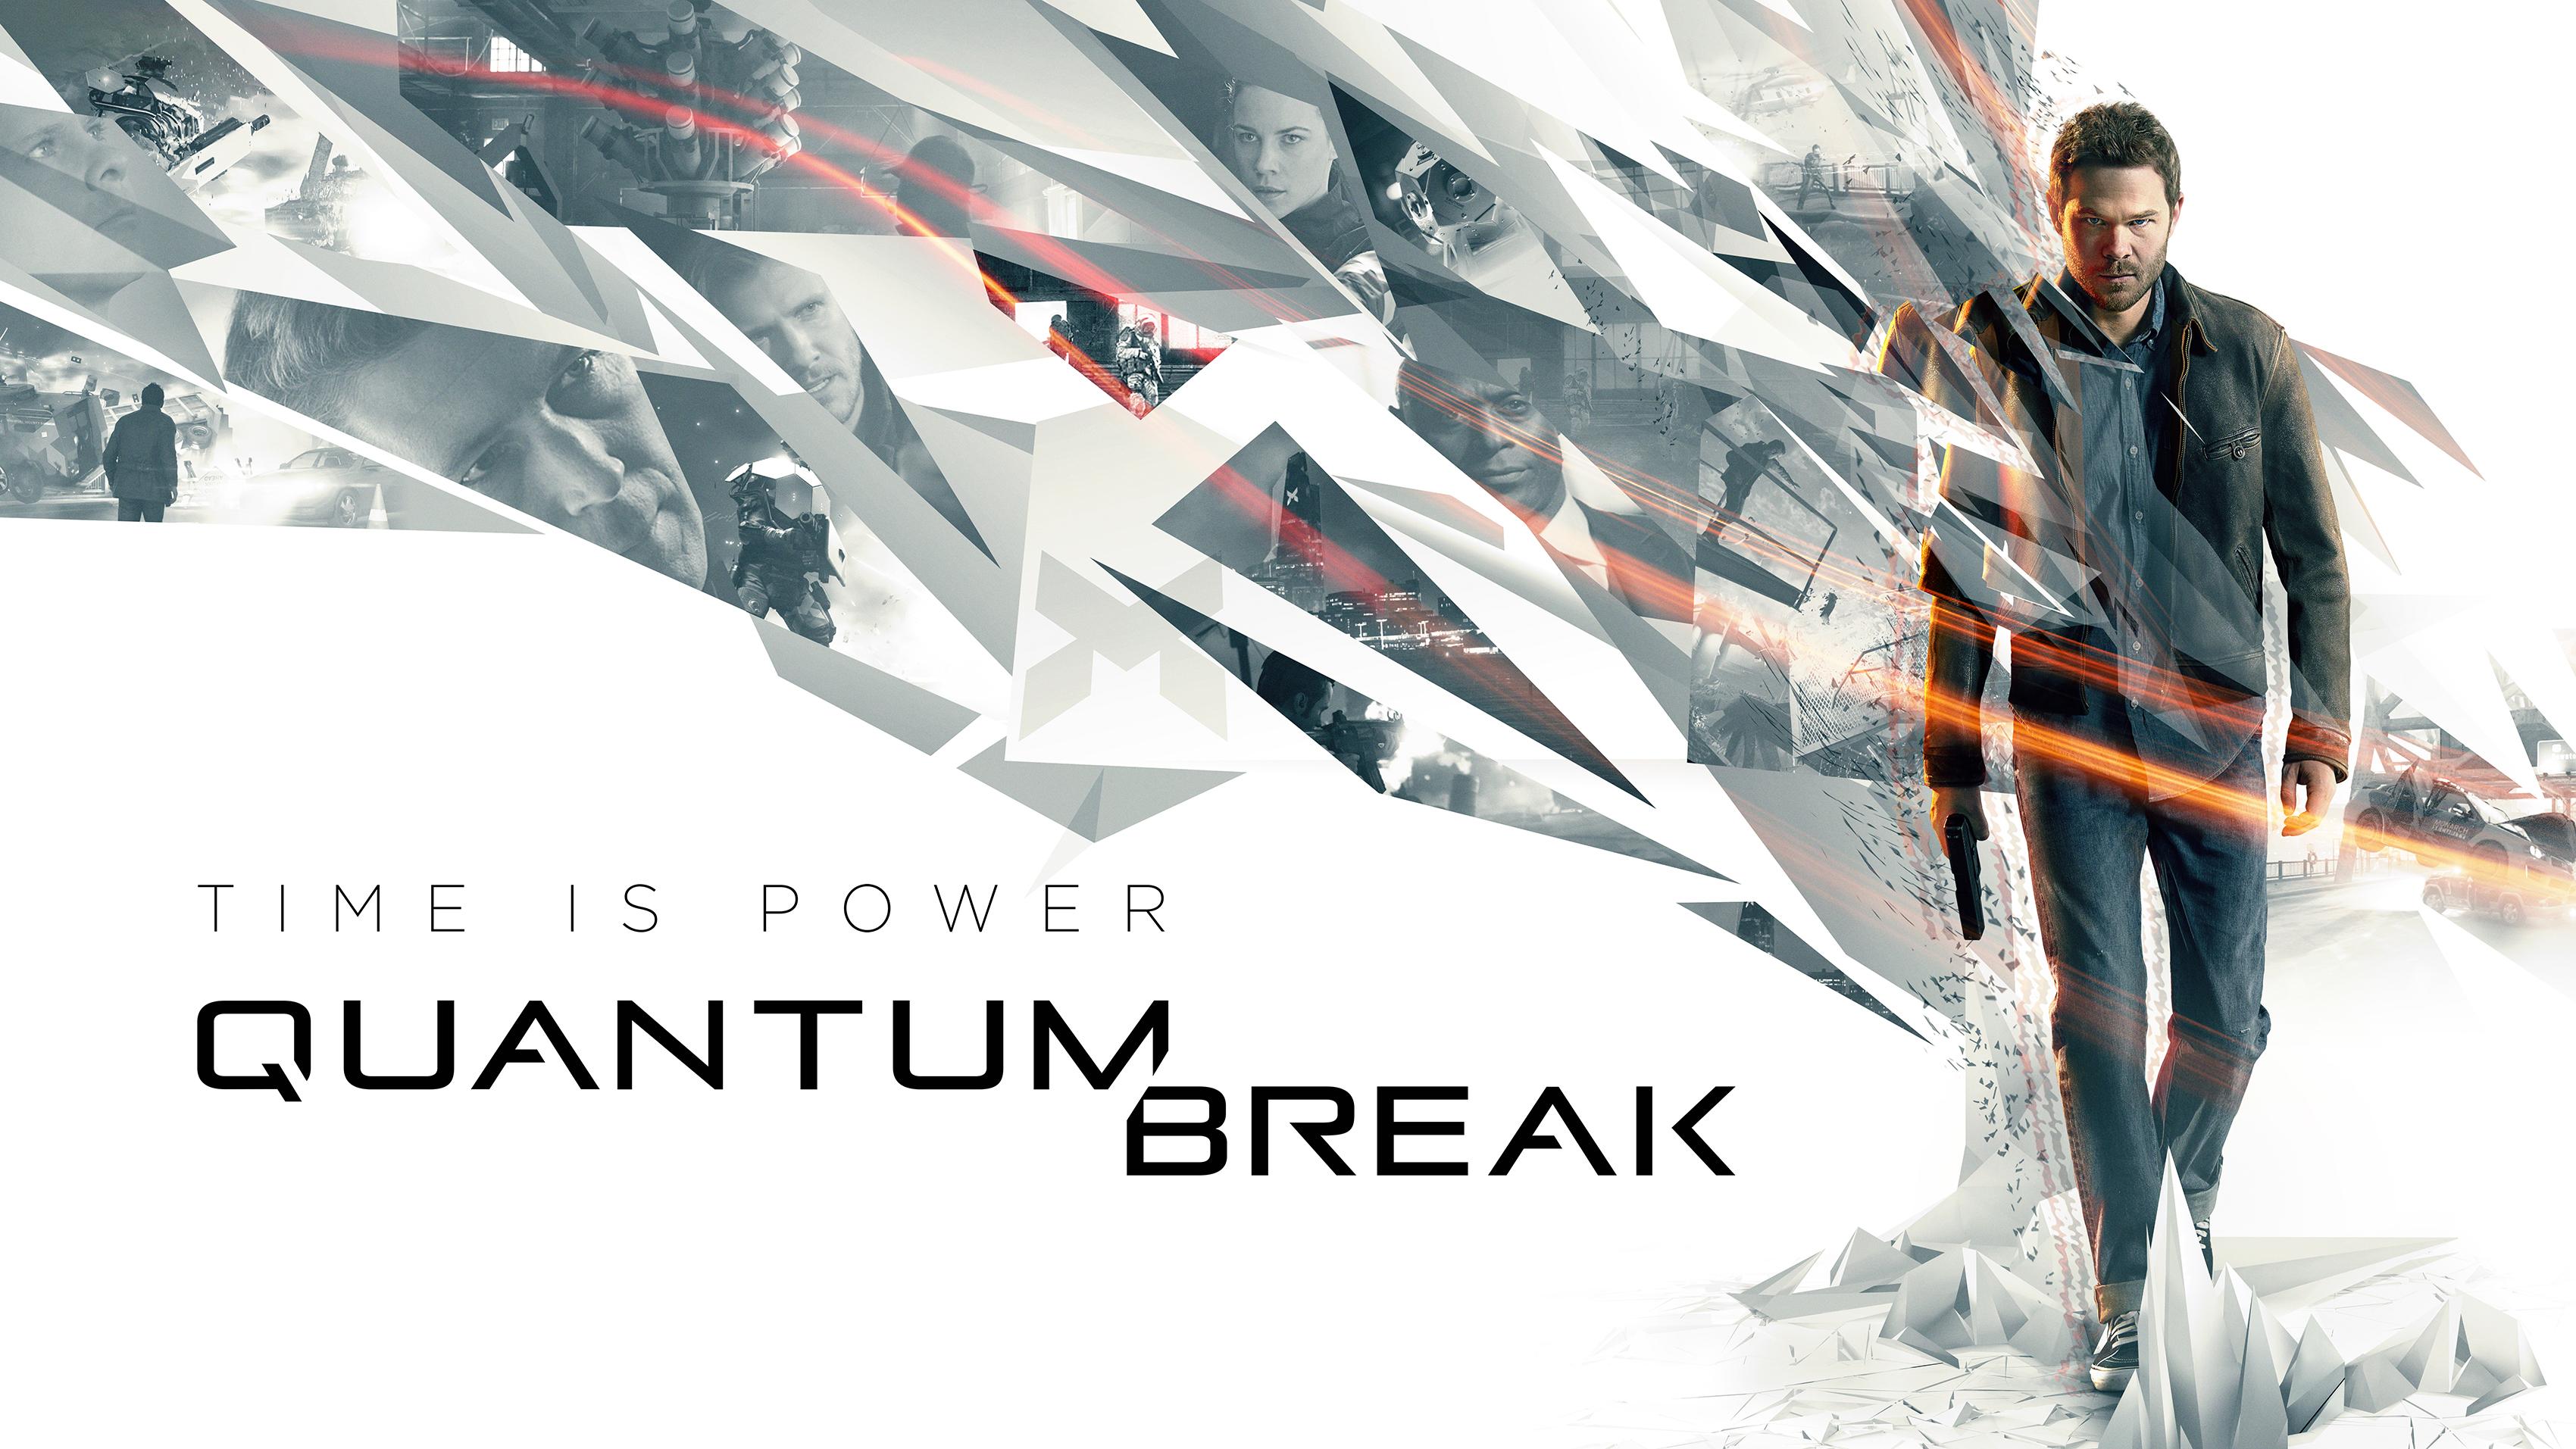 Quantum-Break-Horizontal-Key-Art-jpg